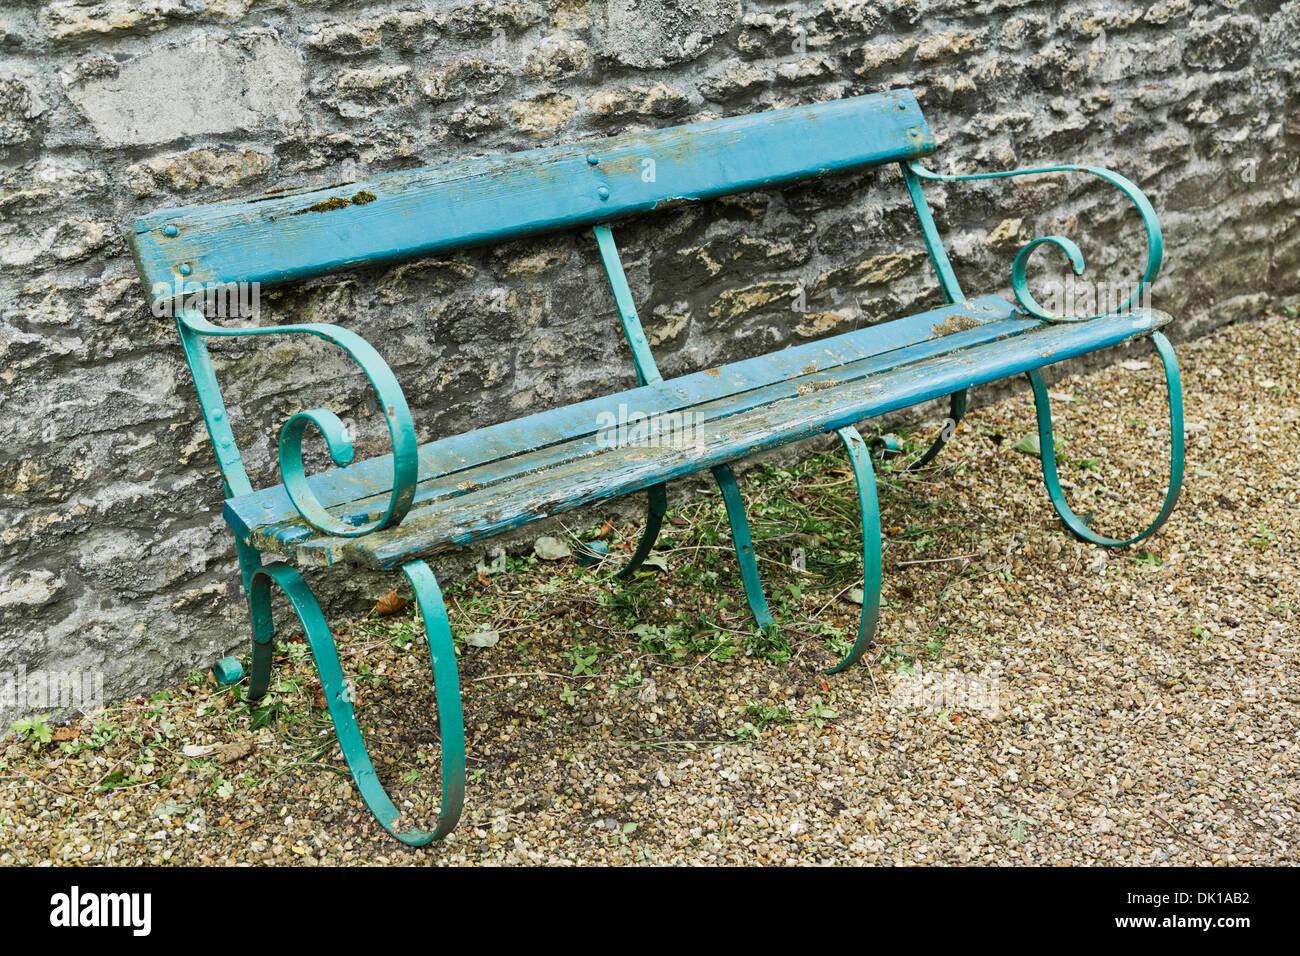 Panchine Da Giardino In Ghisa : Vecchia panchina da giardino con doghe in legno e struttura in